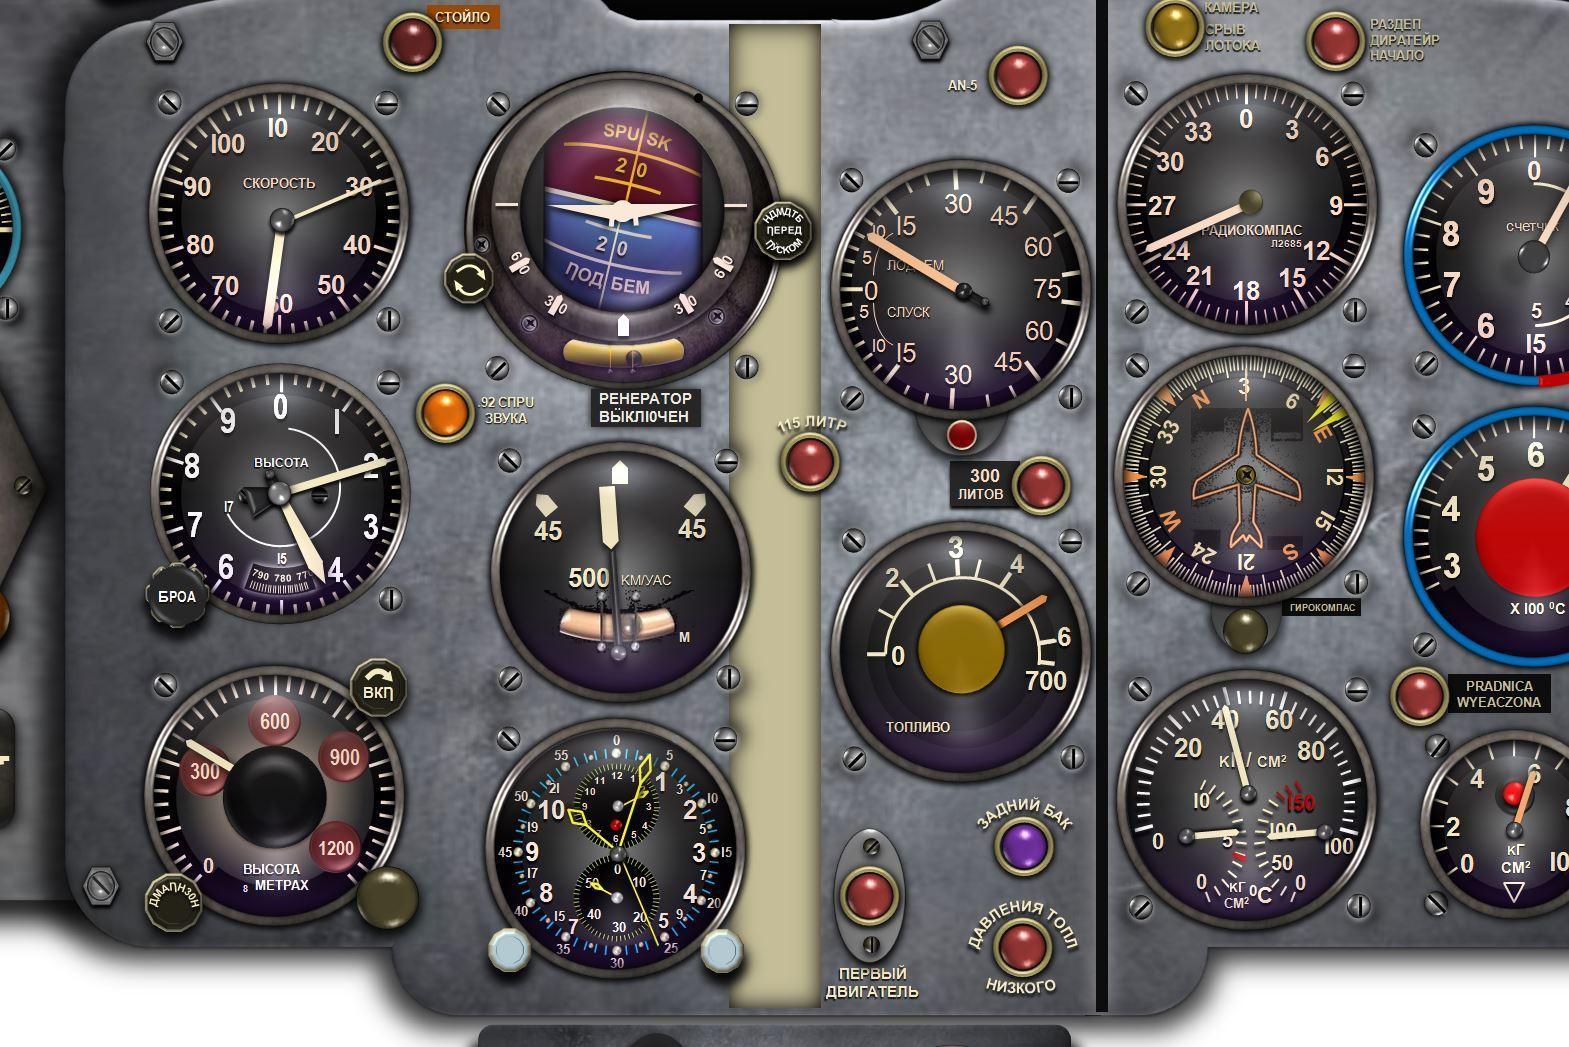 Click image for larger version  Name:MiG15-MiG17-SERIES-COCKPIT-instrument-panel-CDkit-_57-3.jpg Views:49 Size:269.9 KB ID:2250527